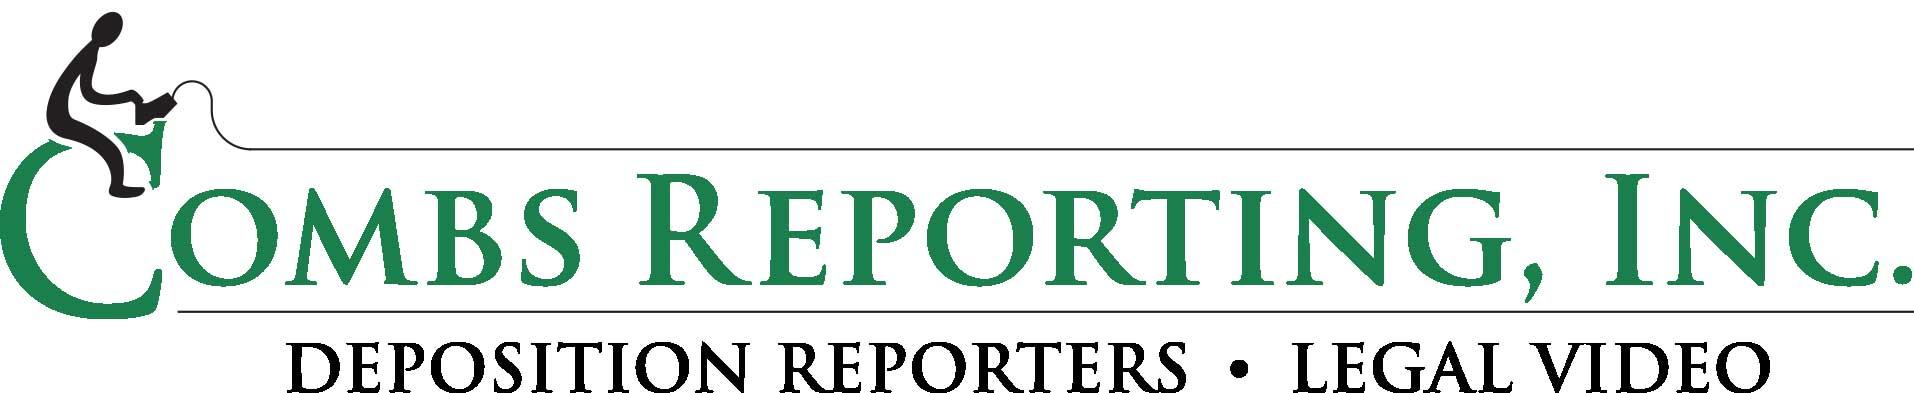 Combs Reporting Logo